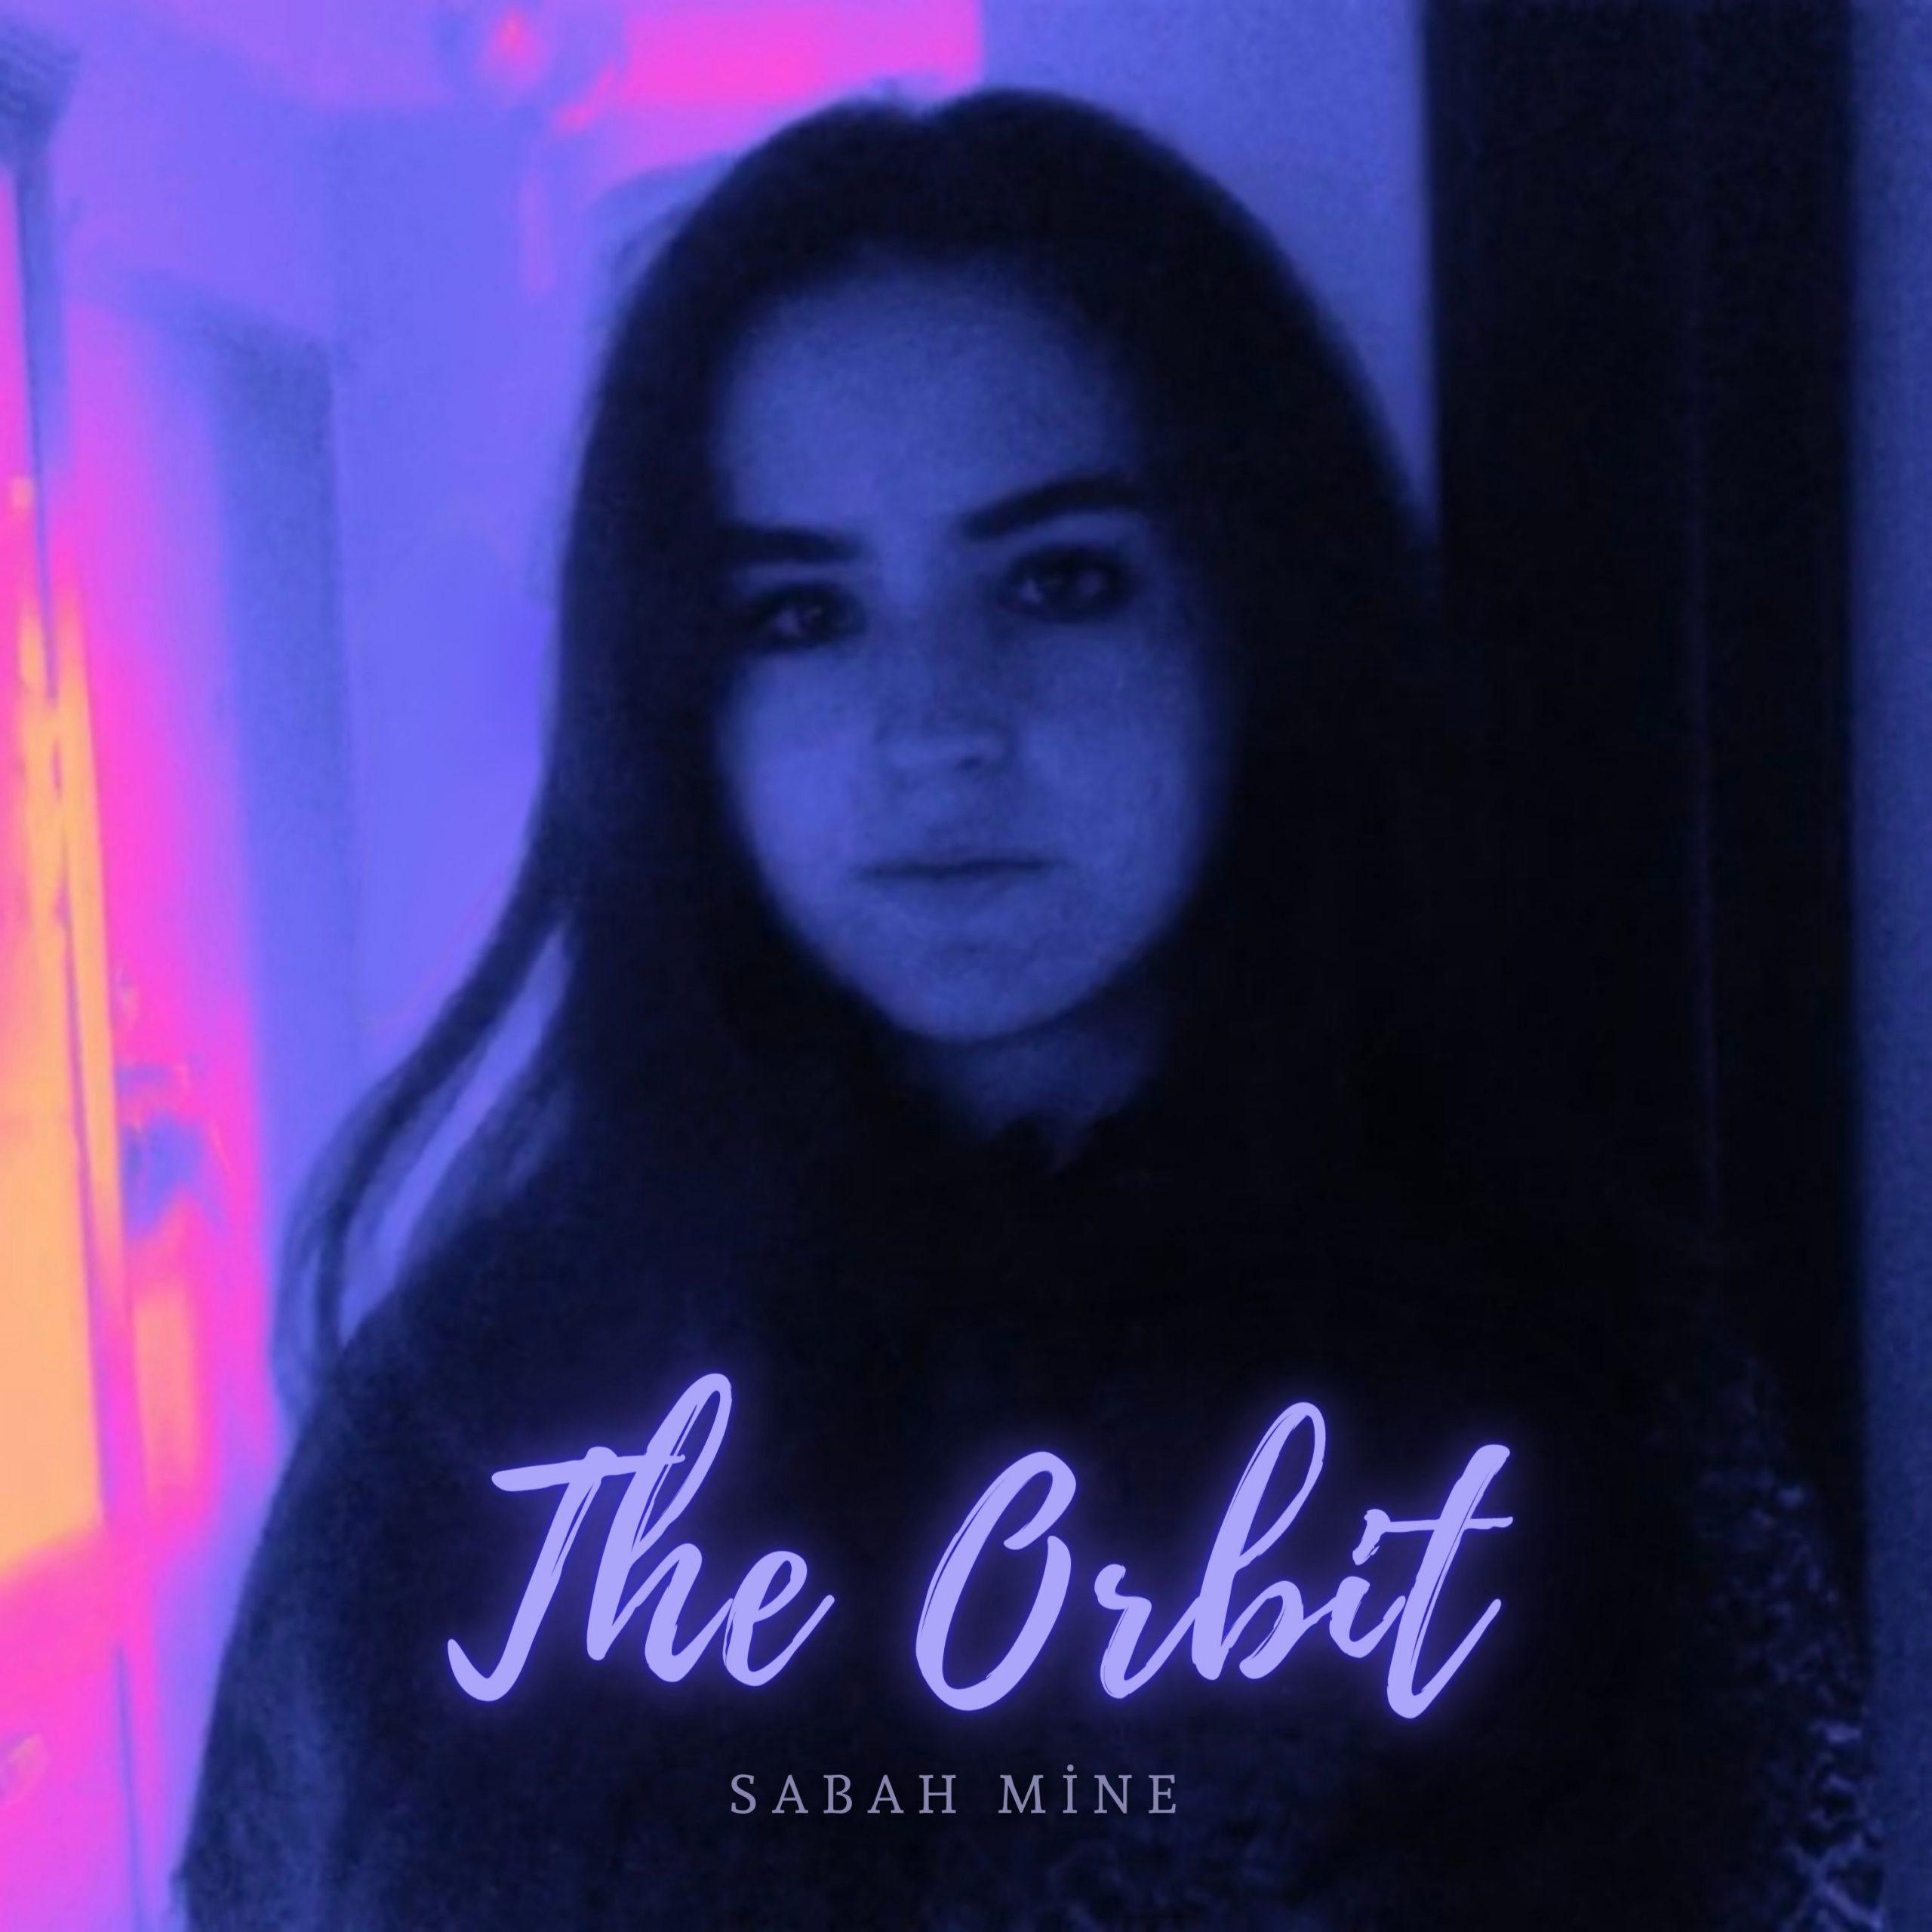 The Orbit – Sabah Mine